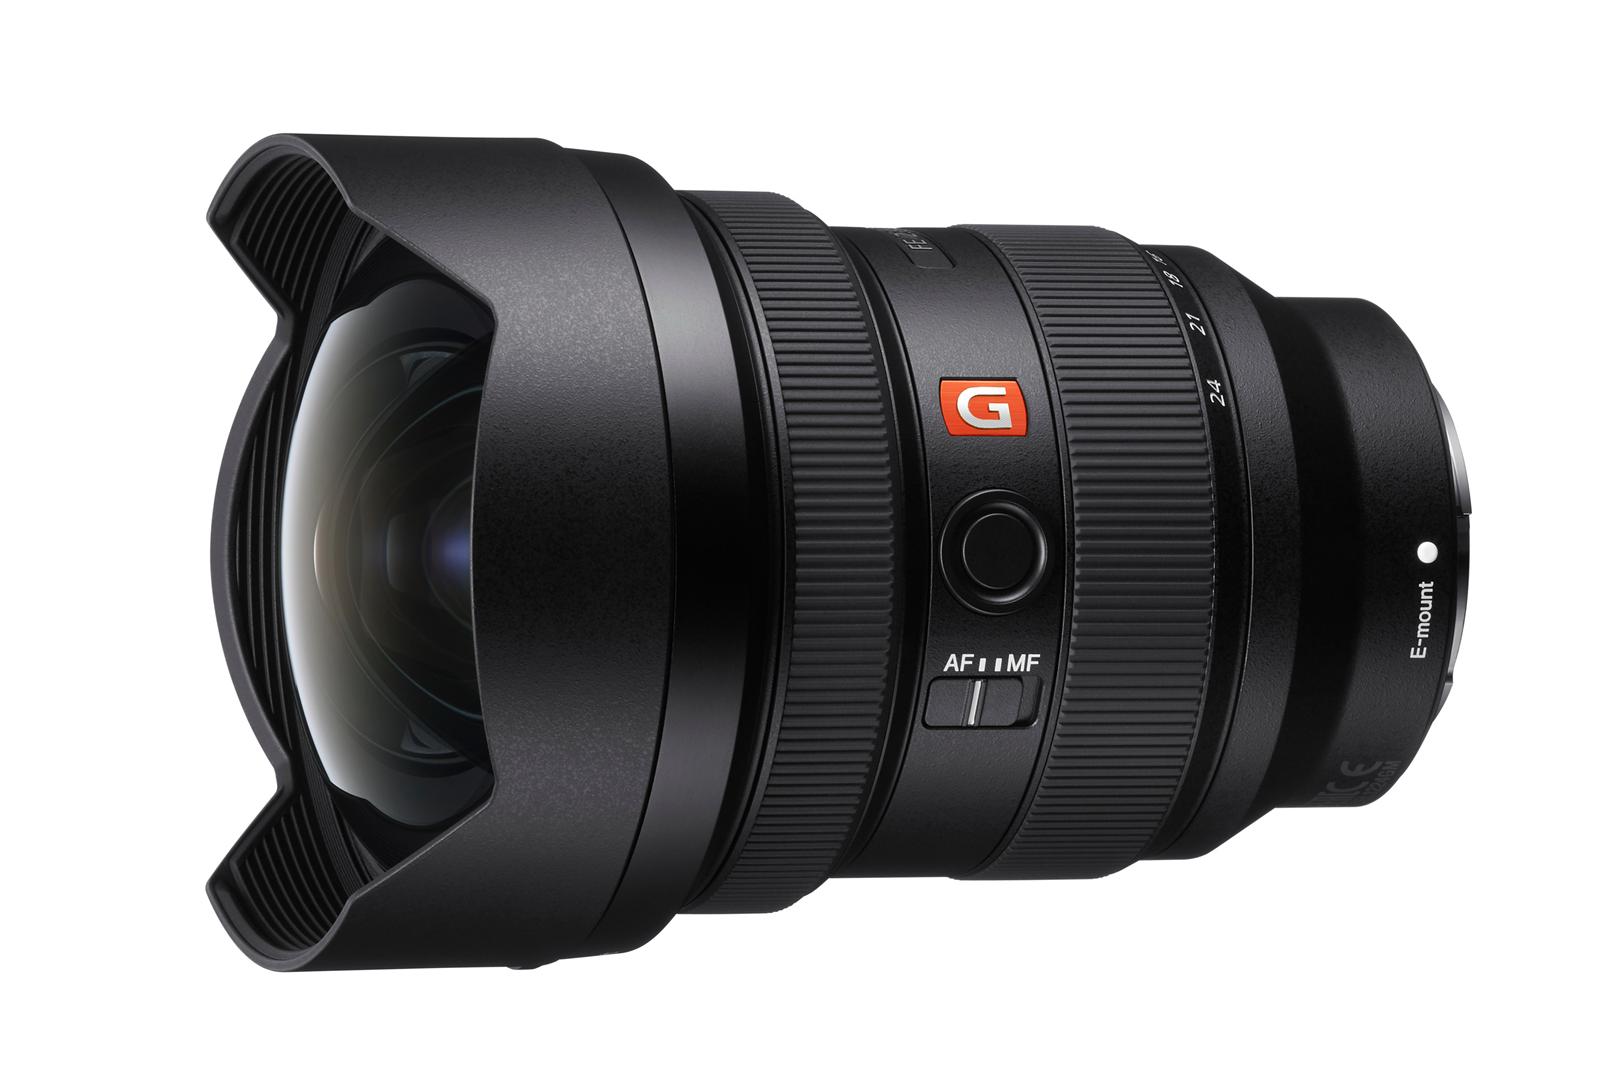 Sony FE 12-24mm F2.8 GM 大光圈超廣角變焦鏡頭 同級鏡頭最輕量化設計 雙組 XD 線性馬達最速對焦 極致畫質展現 @3C 達人廖阿輝